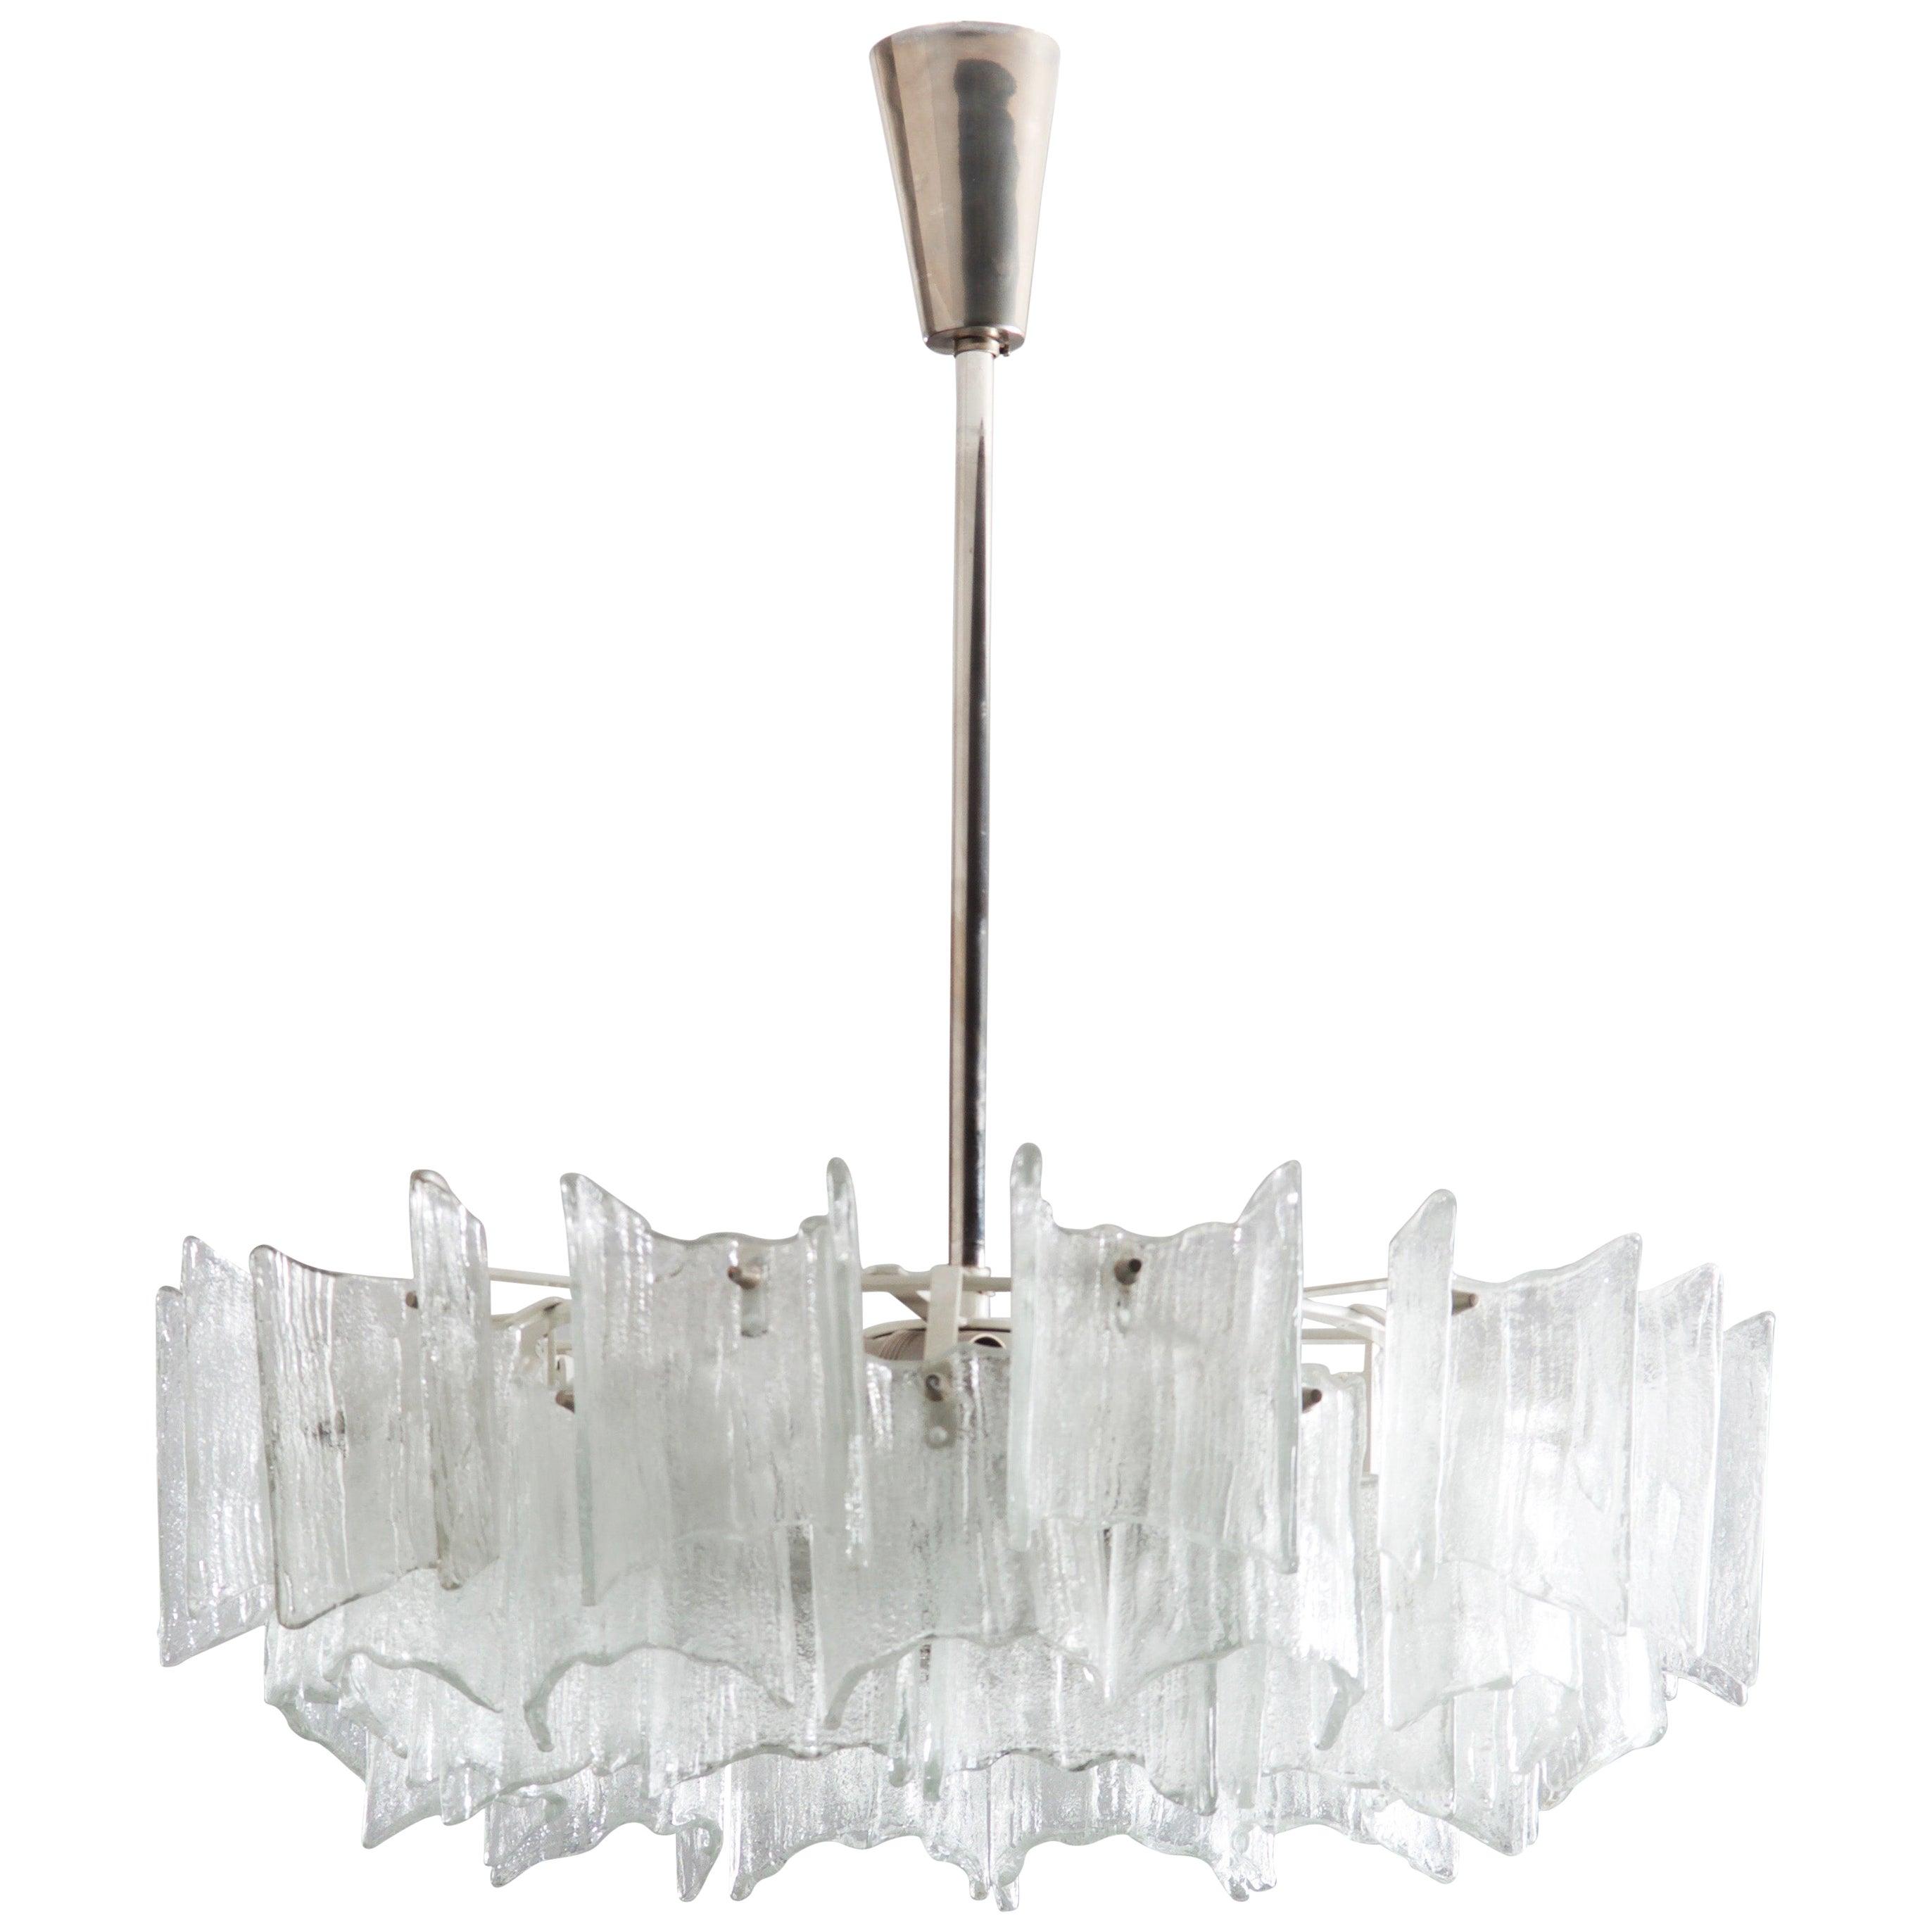 Frosted Glass Chandelier By J. T. Kalmar